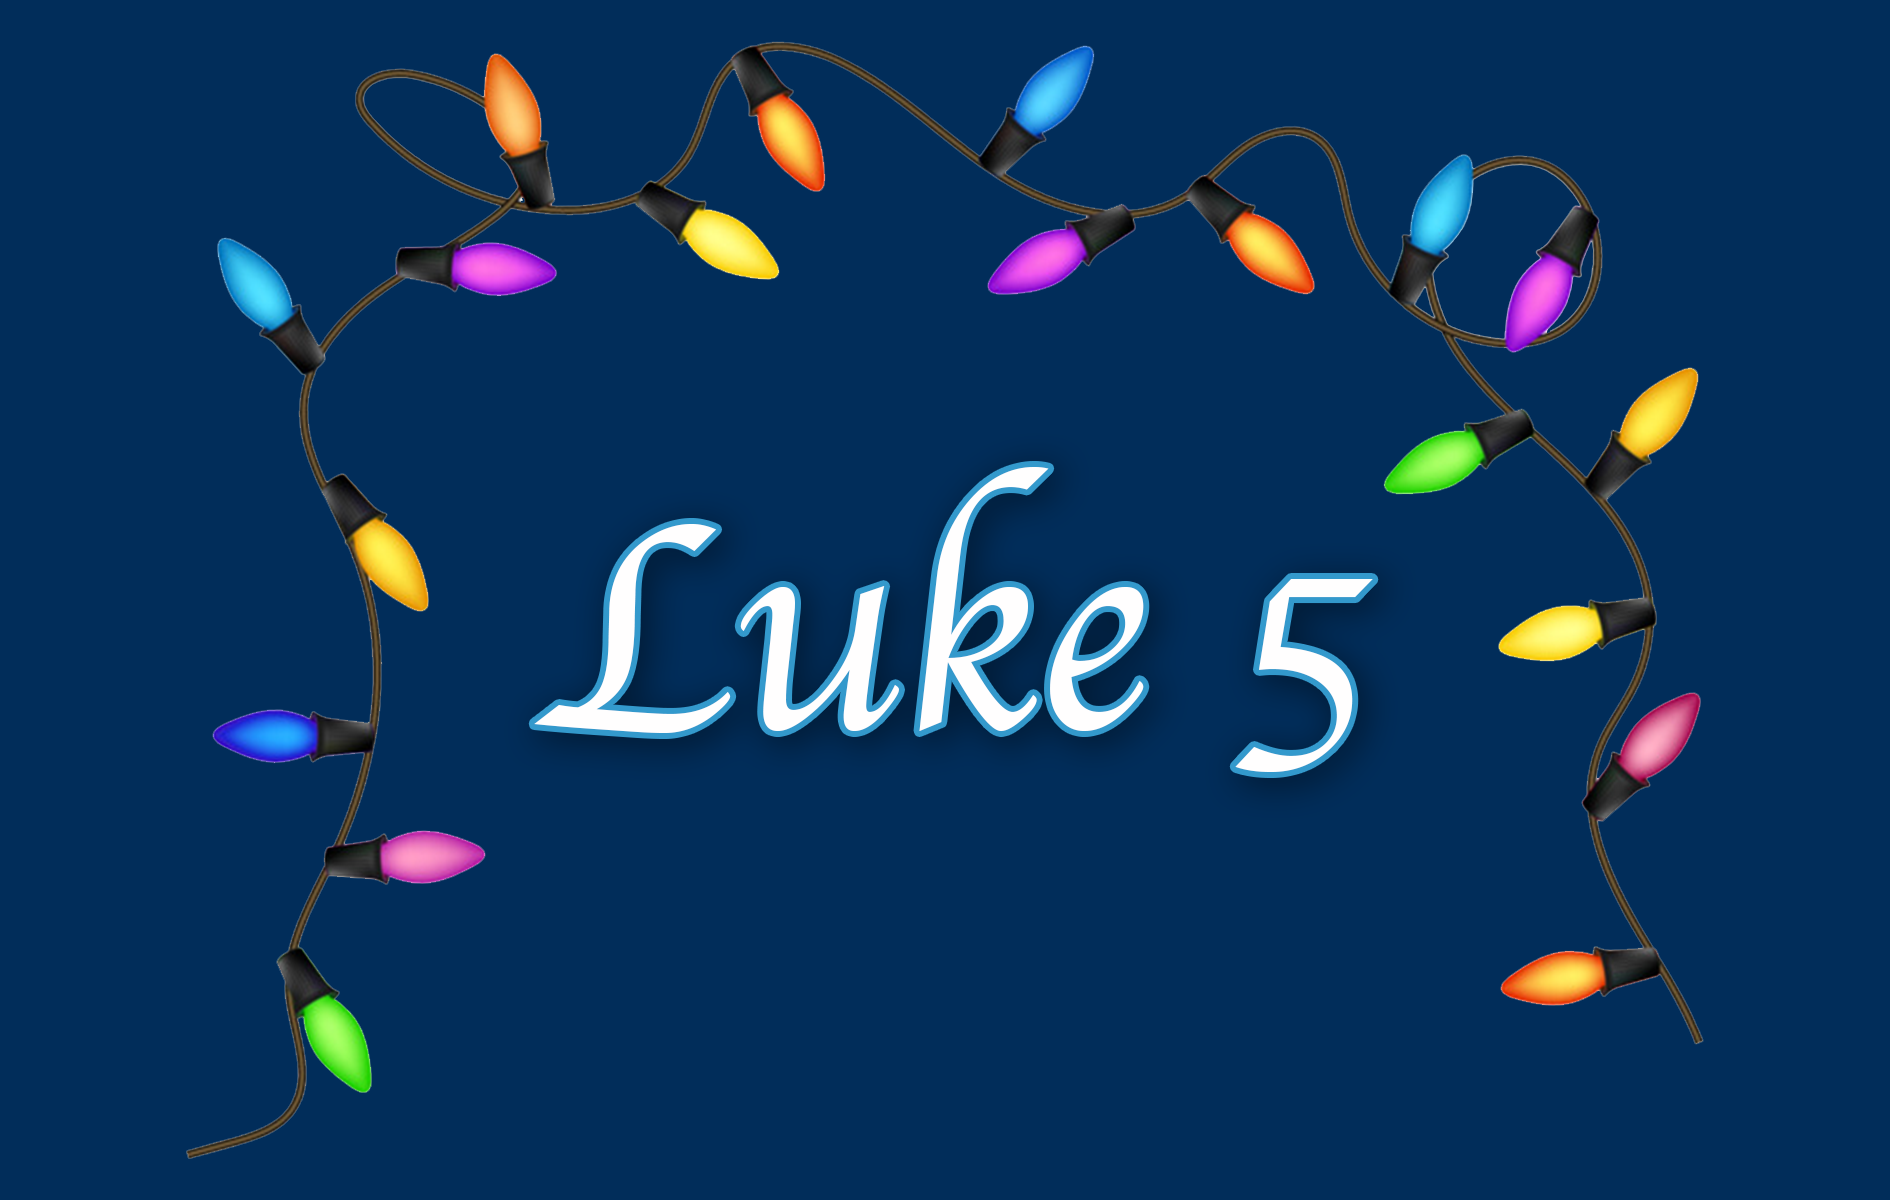 Julemysteriet – del 5